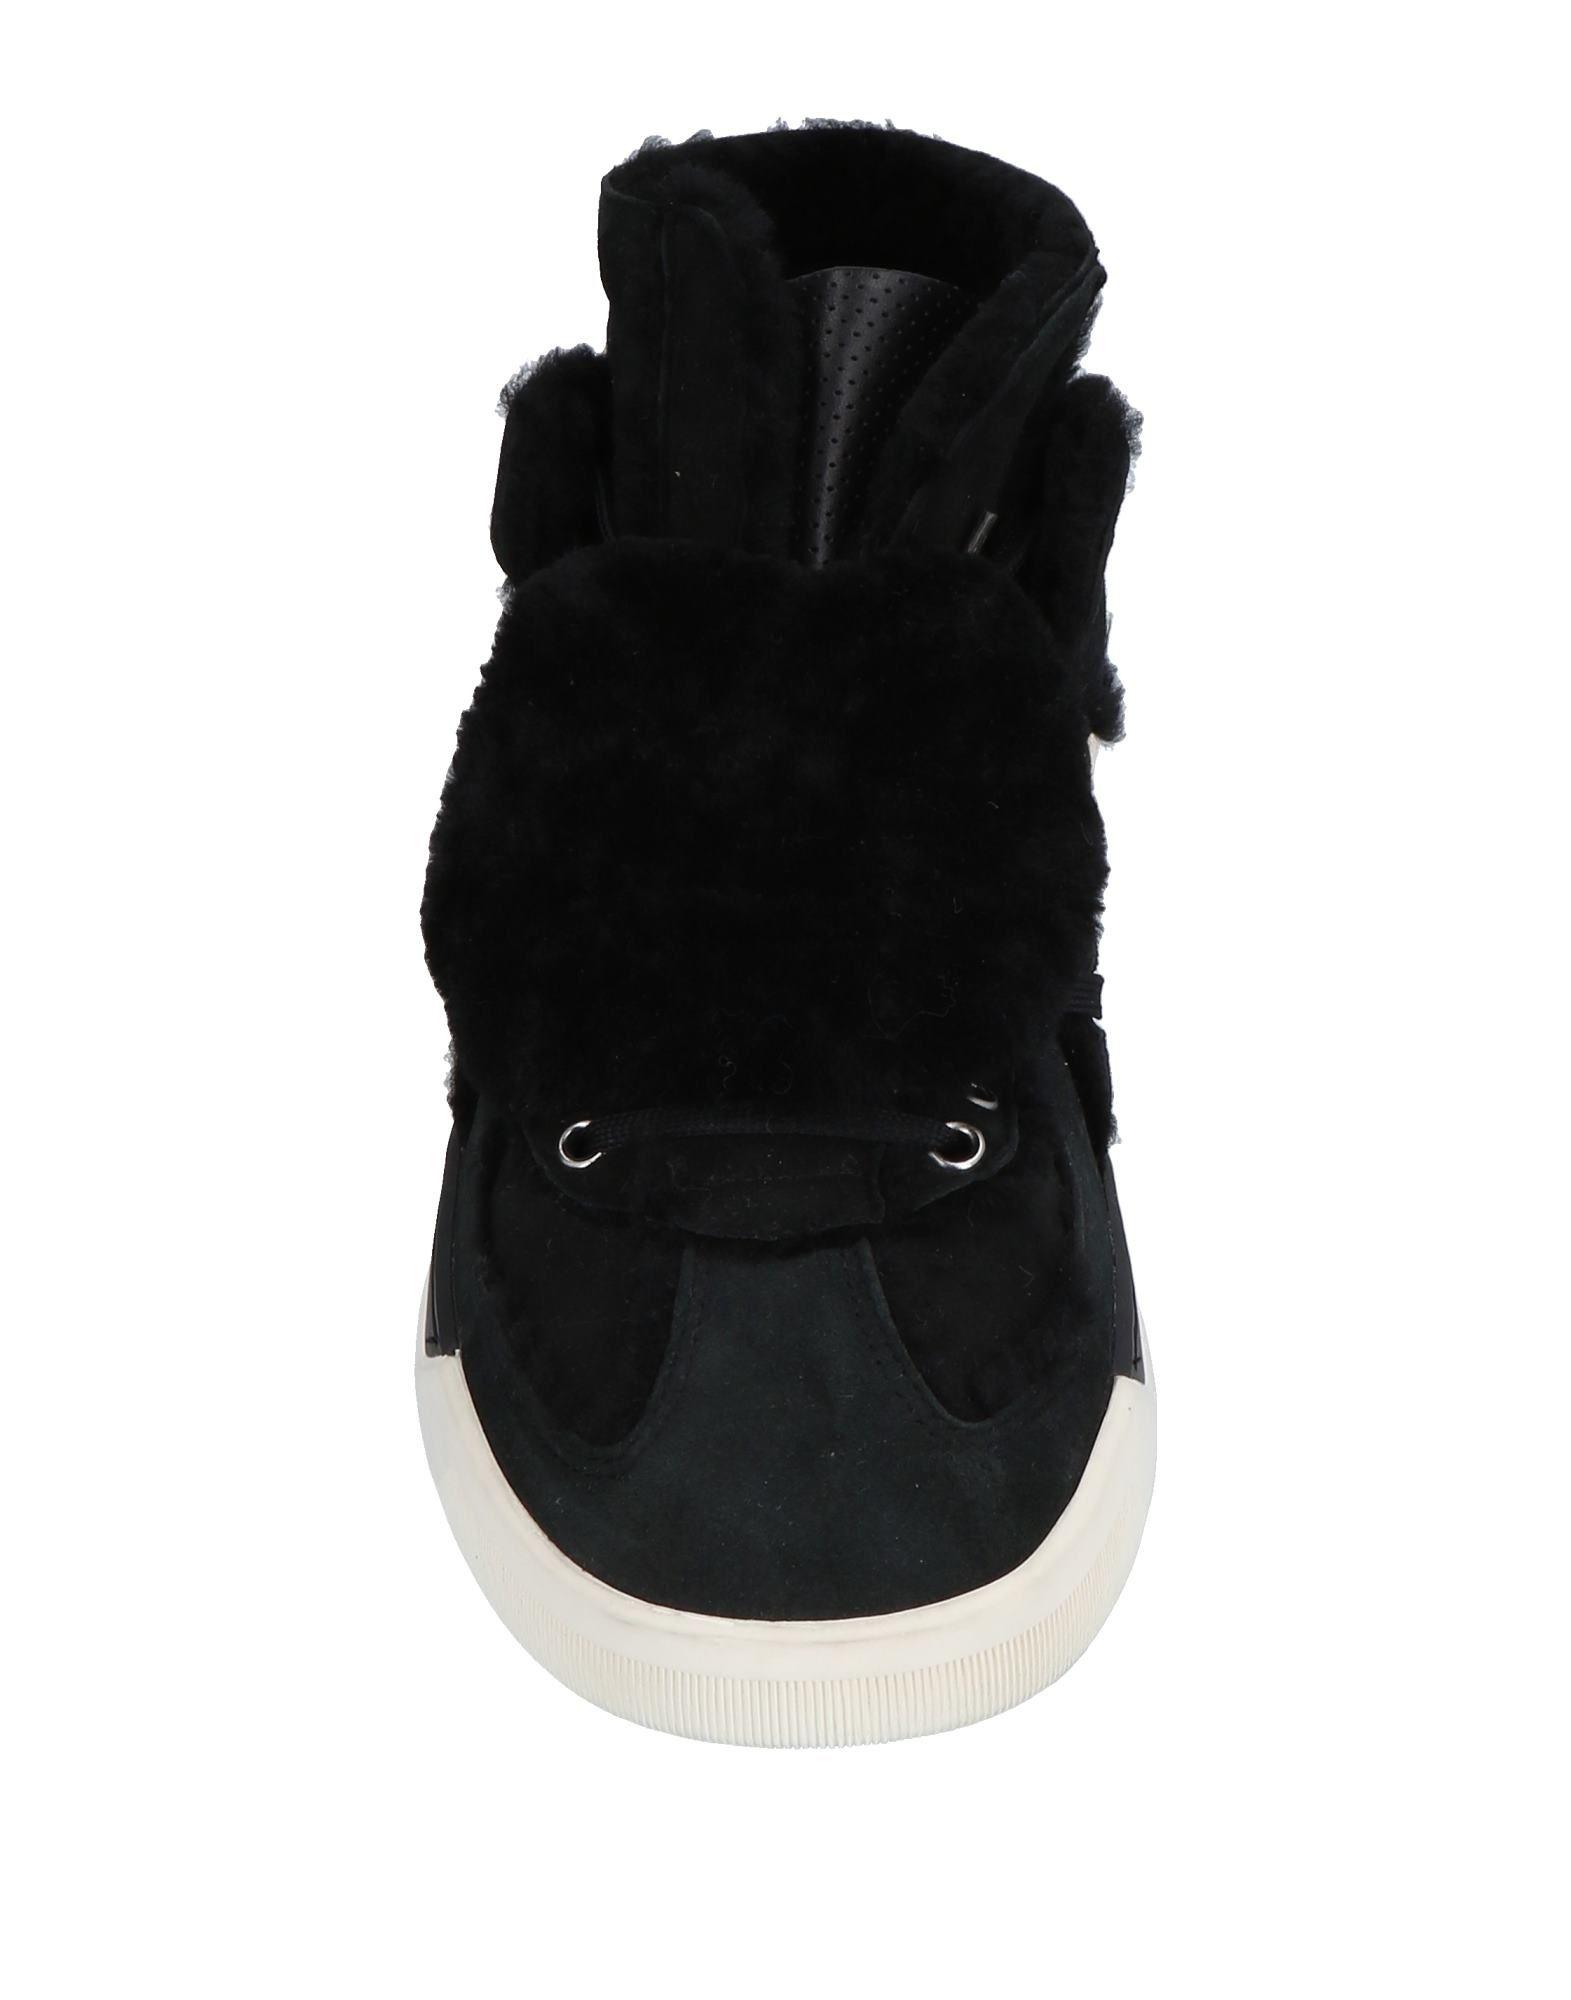 Dolce 11492988QQ & Gabbana Sneakers Herren  11492988QQ Dolce ec5172